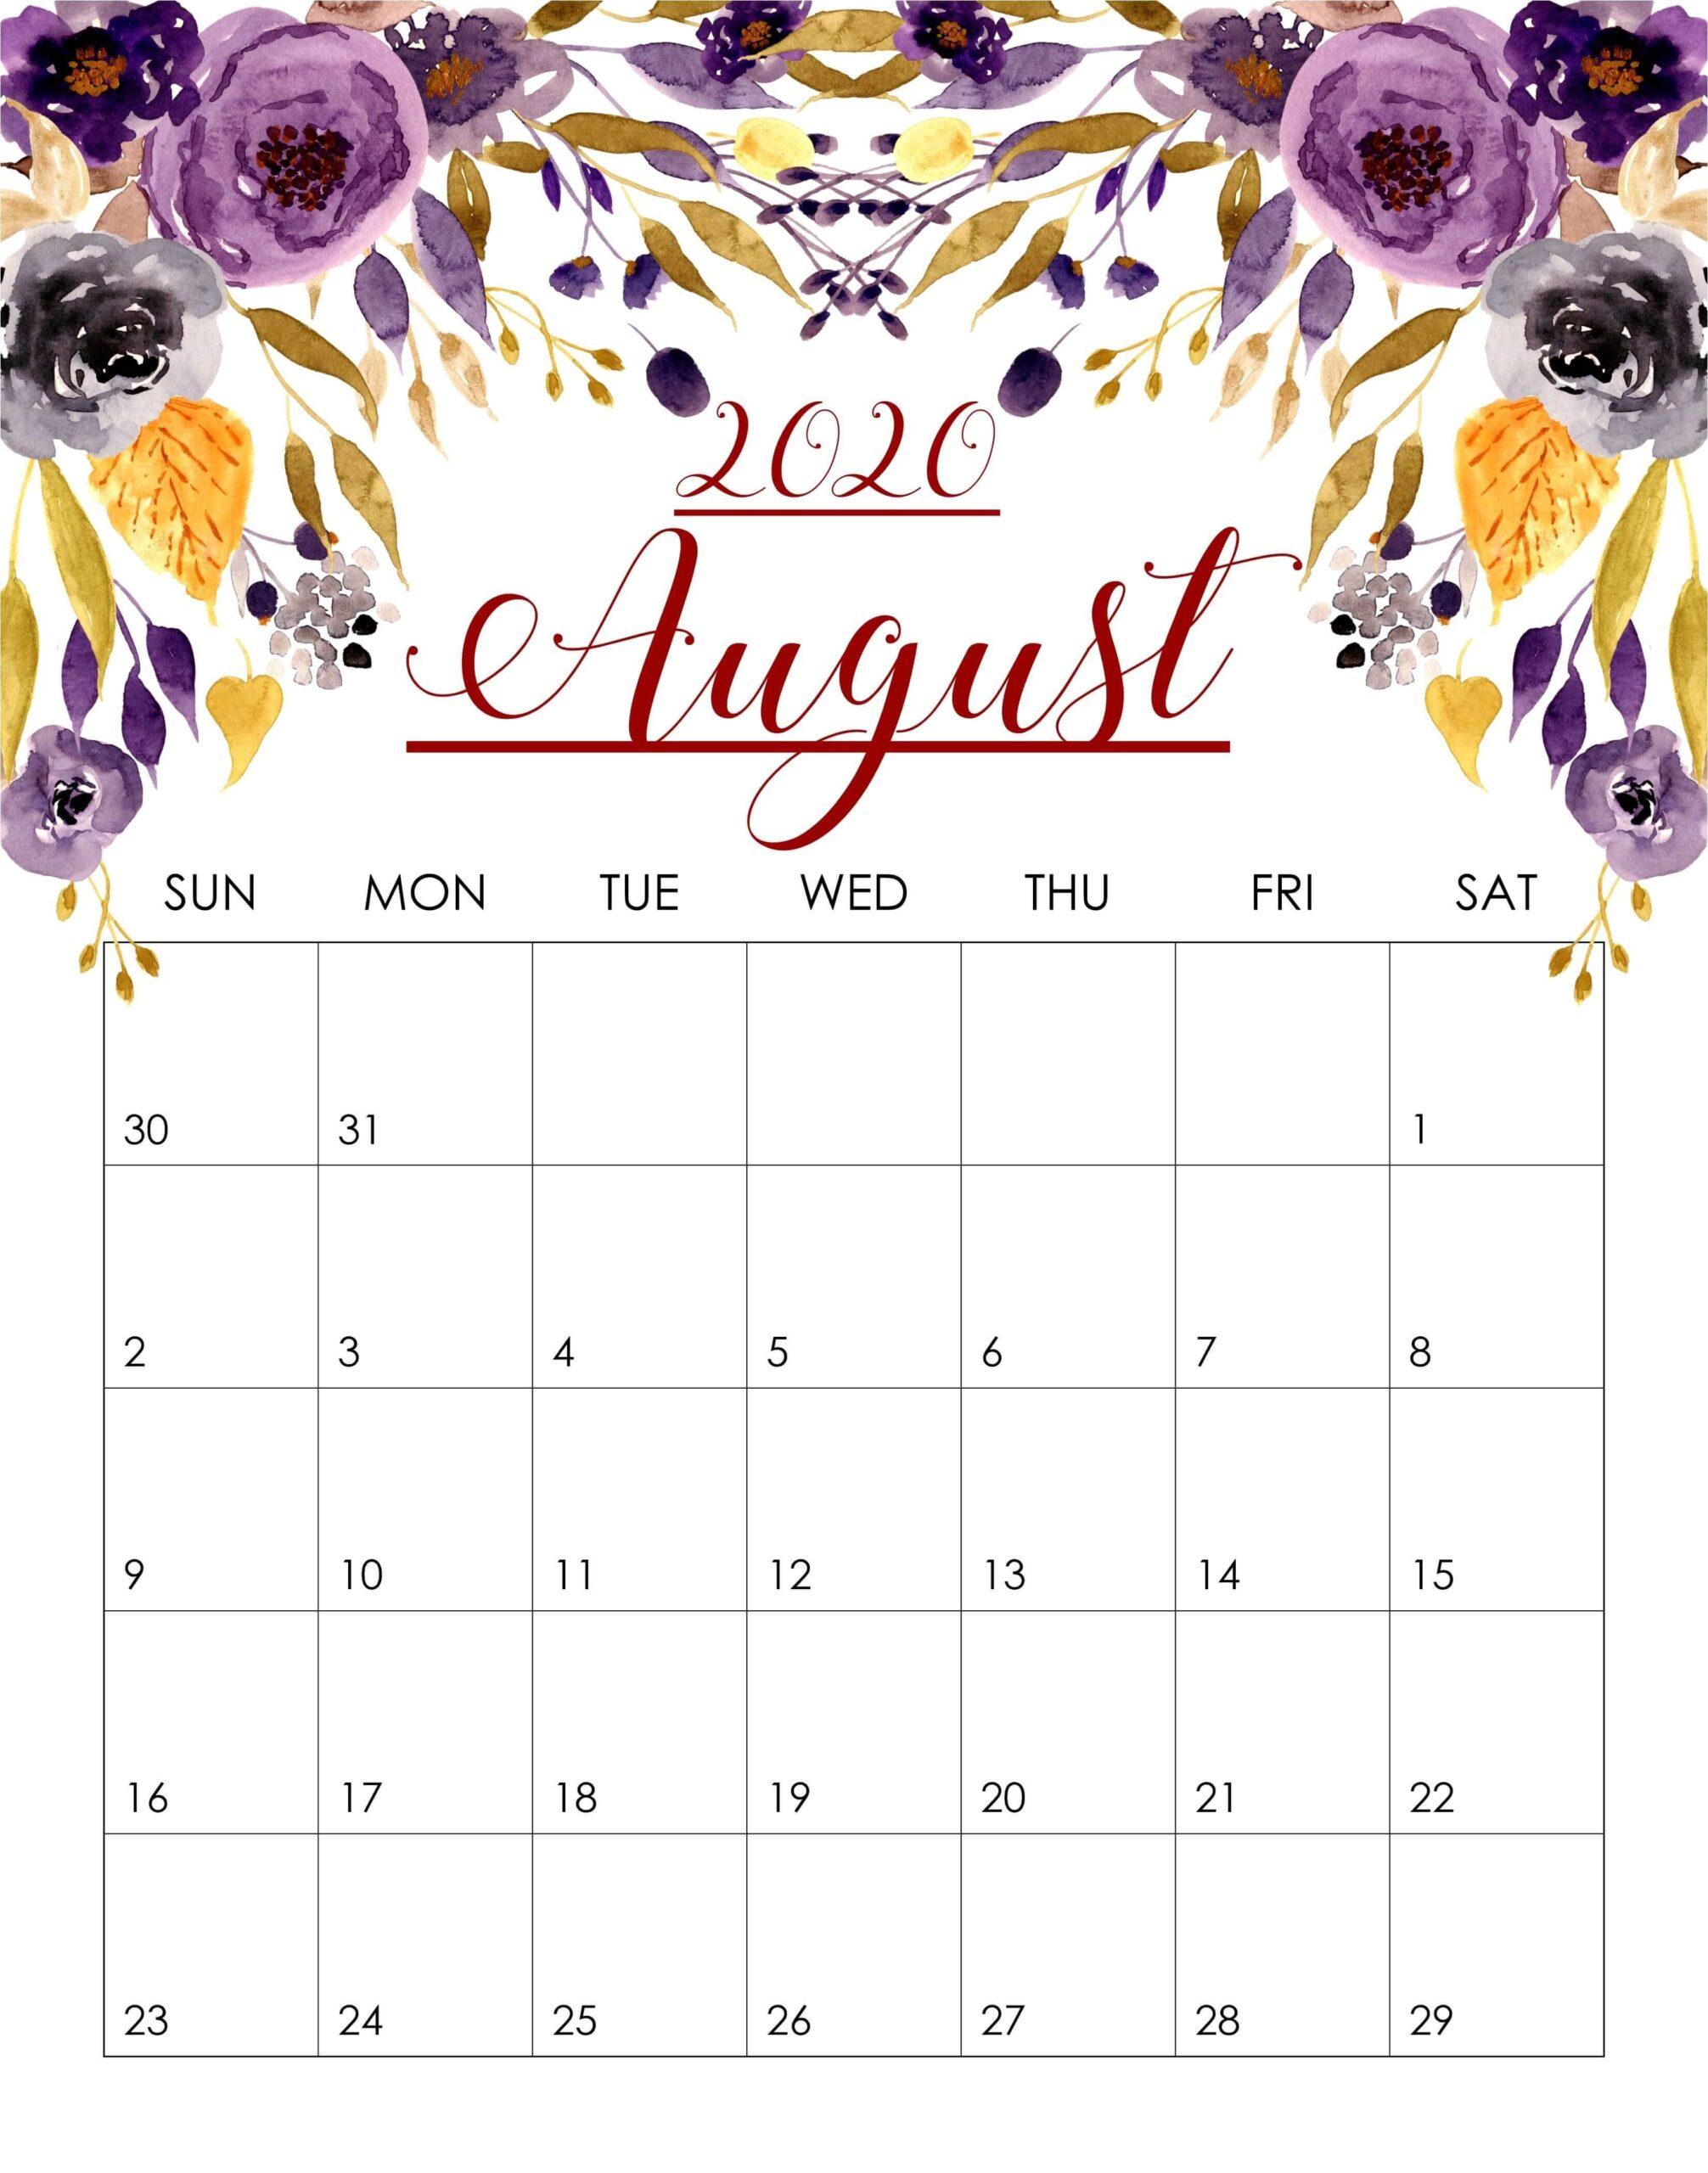 Cute August 2020 Calendar Template